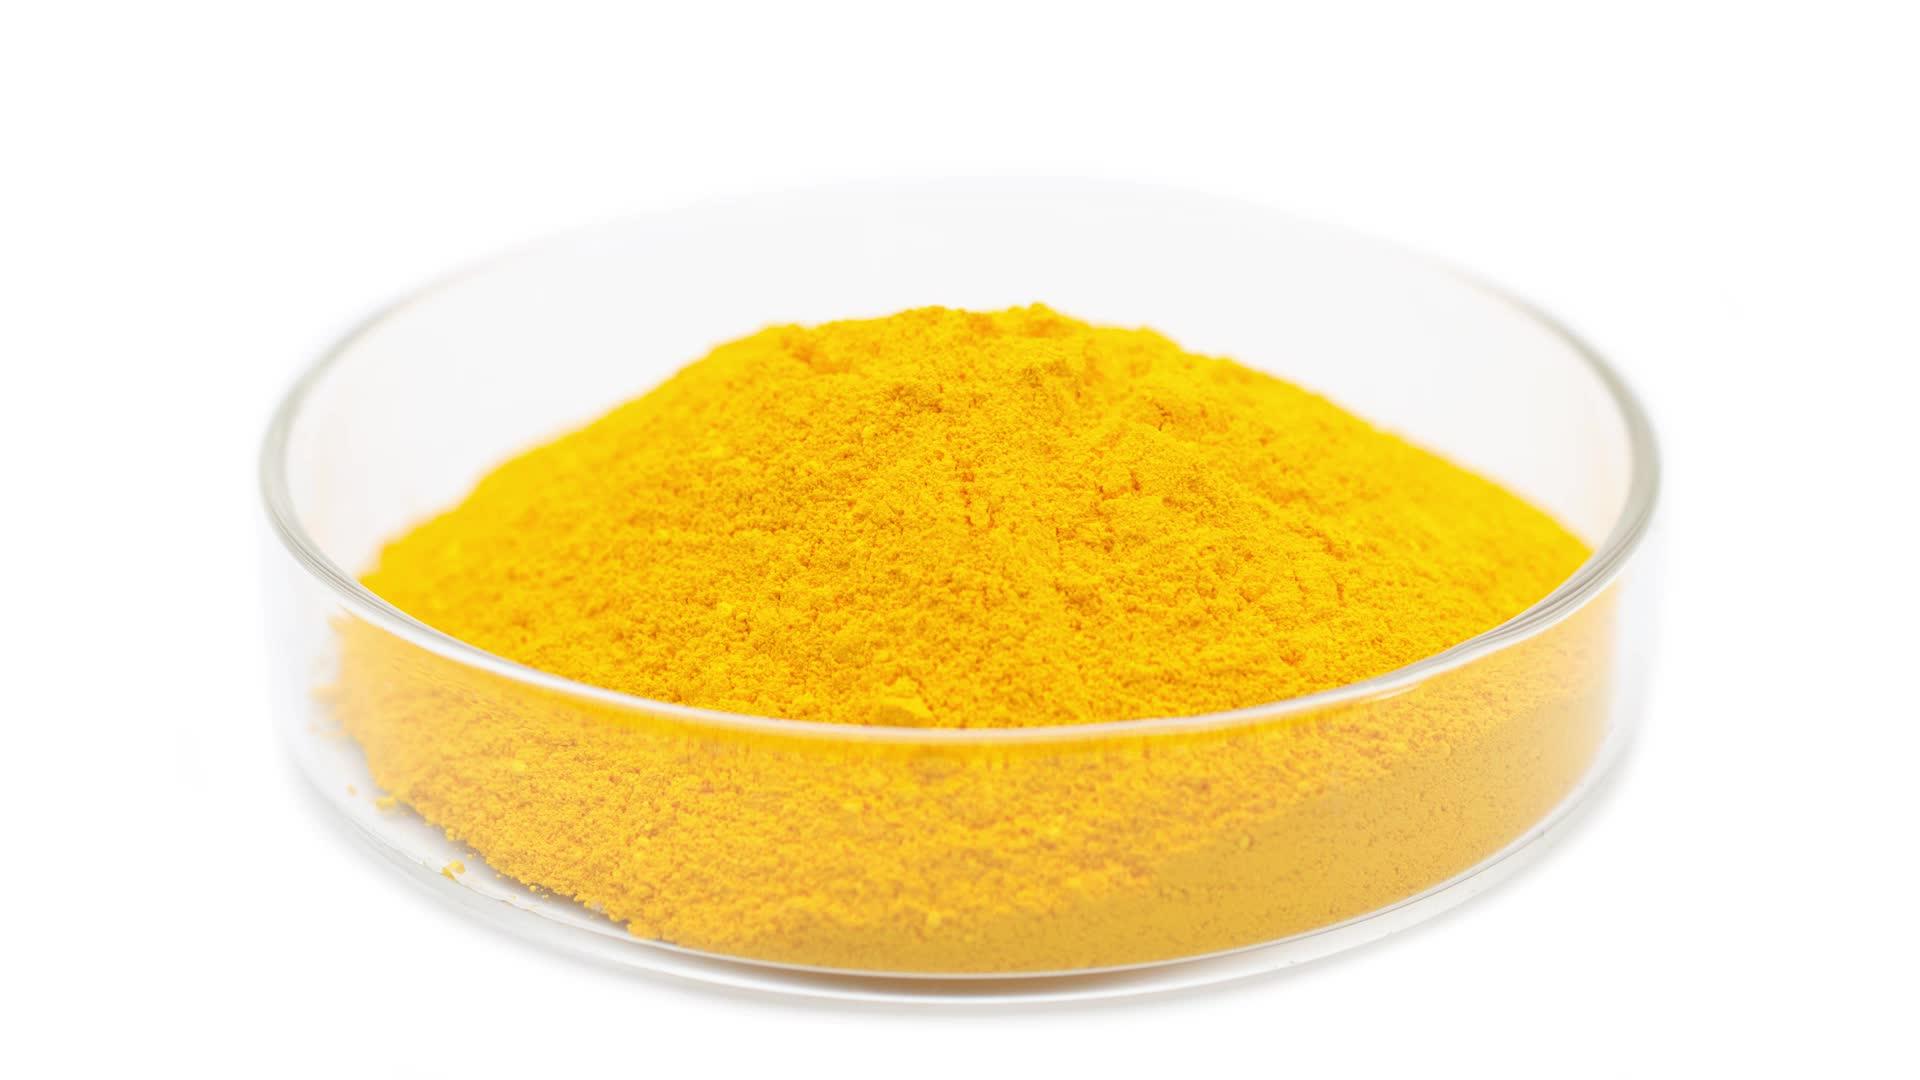 Geel 313 Kleur asfalt pigment fosforescerende pigment poeder